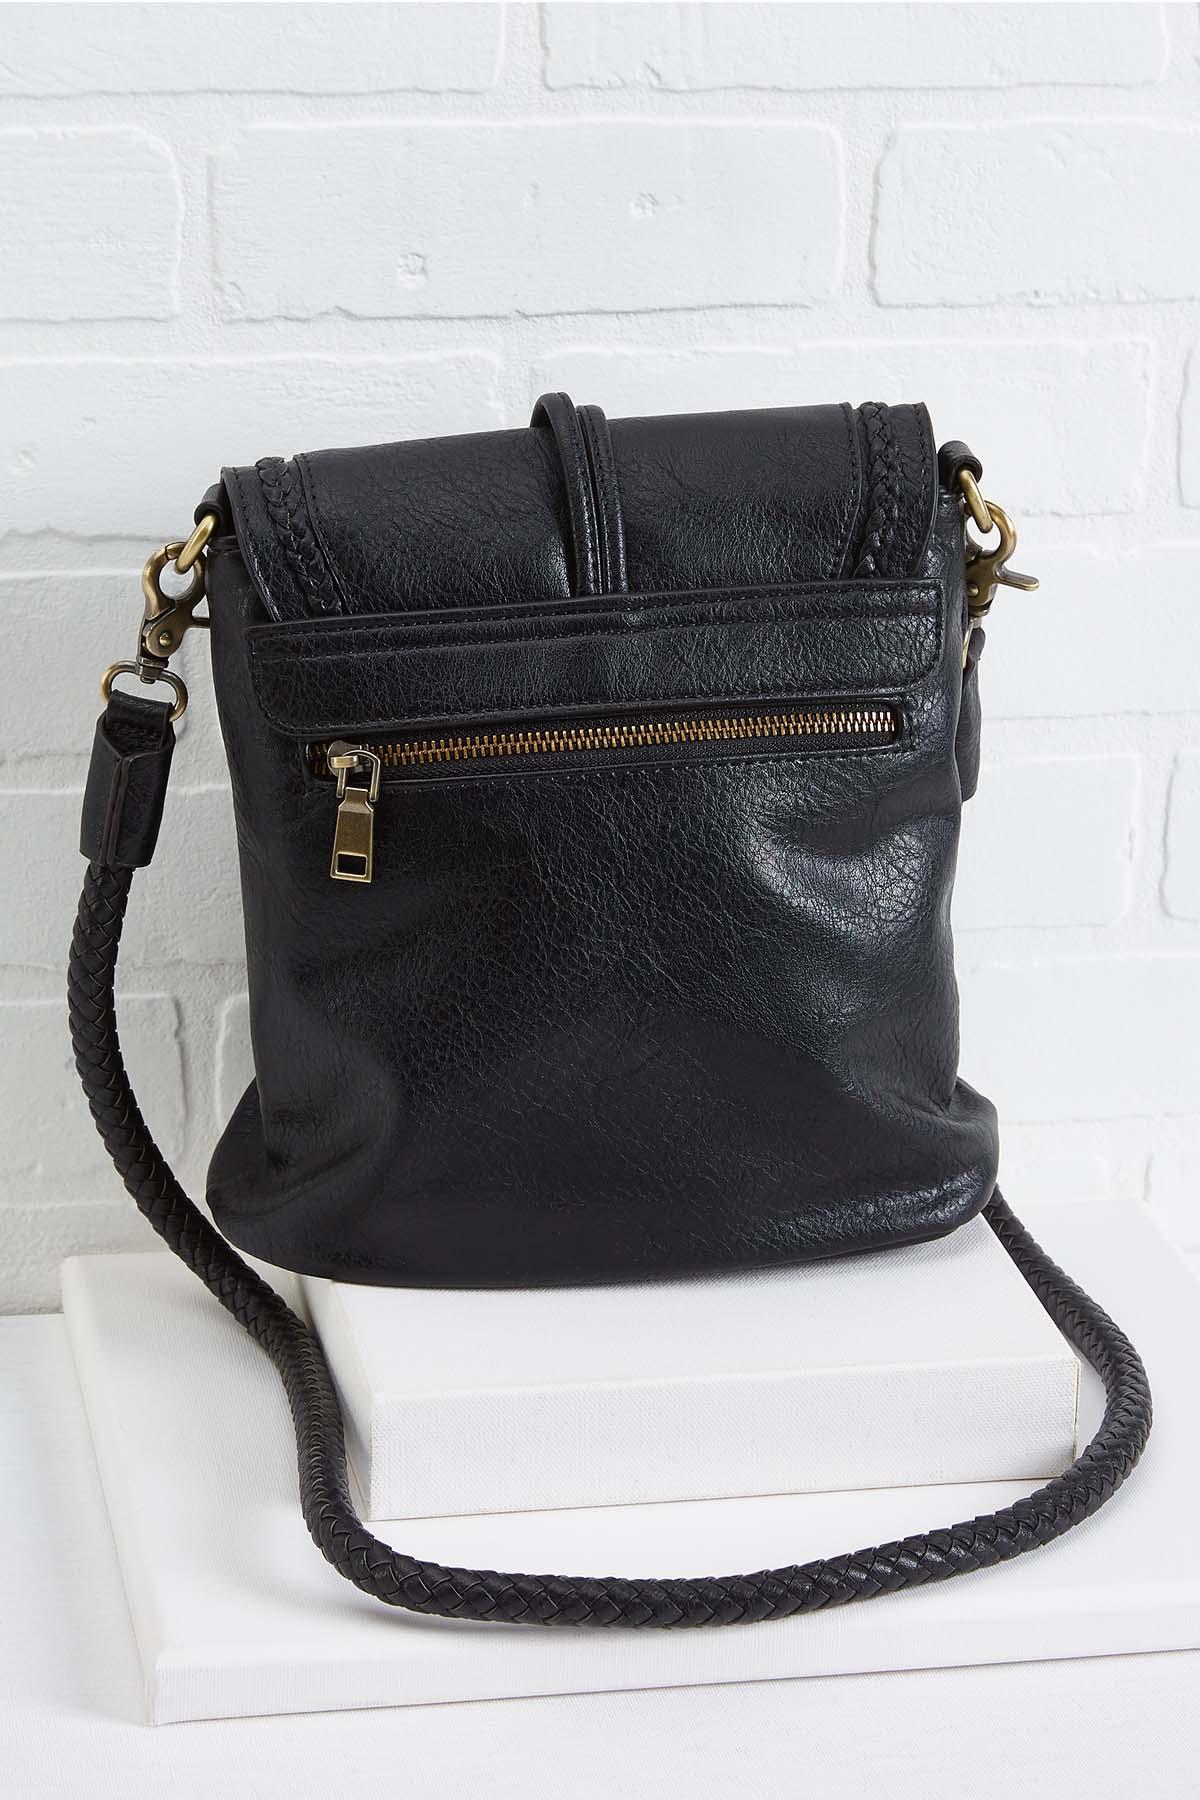 Crossbody My Heart Bag